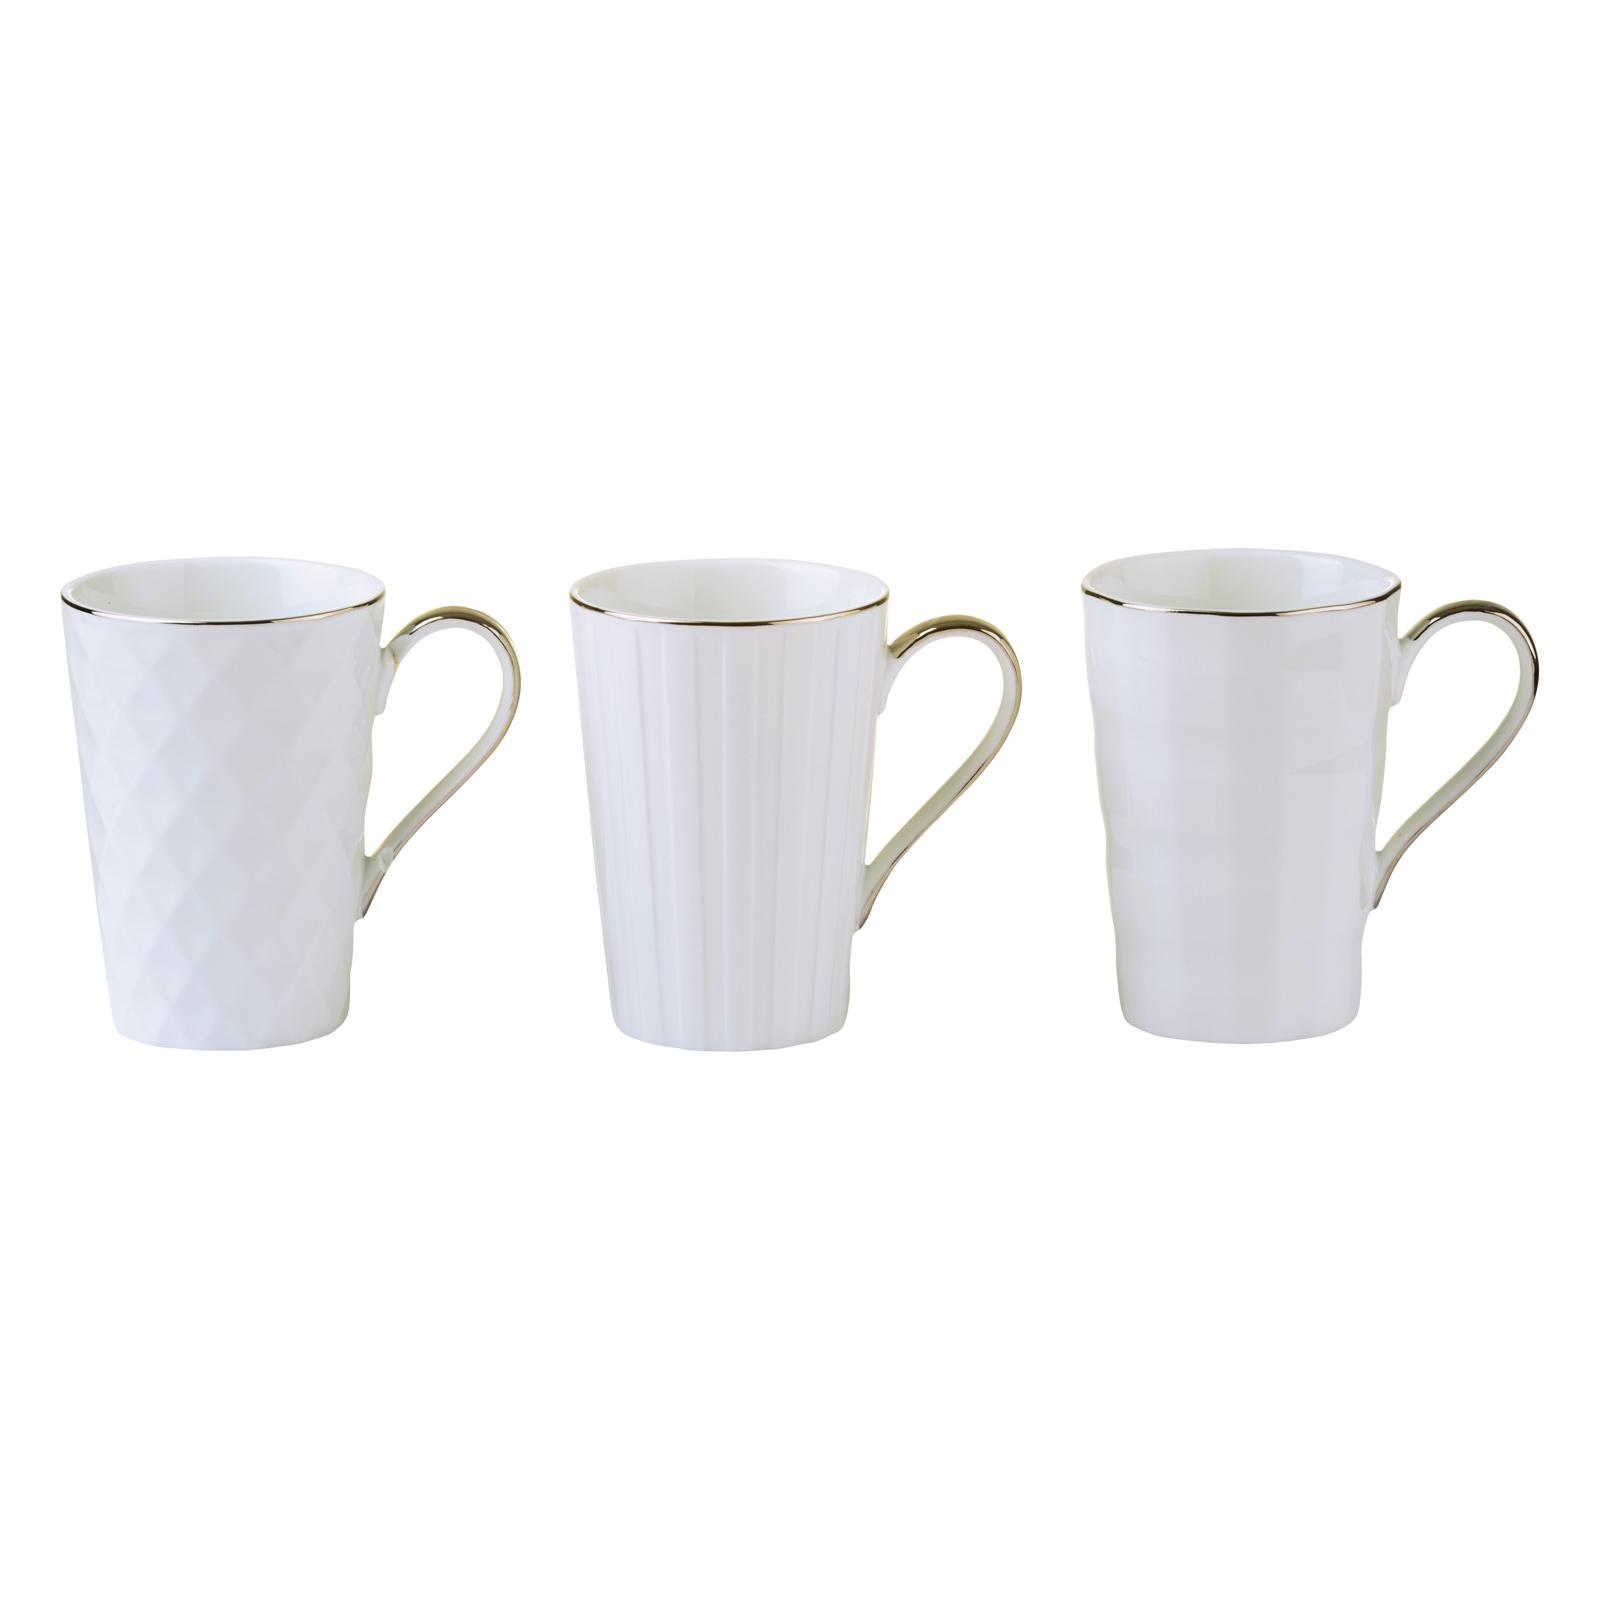 Set of 3 Lux Mugs Gold